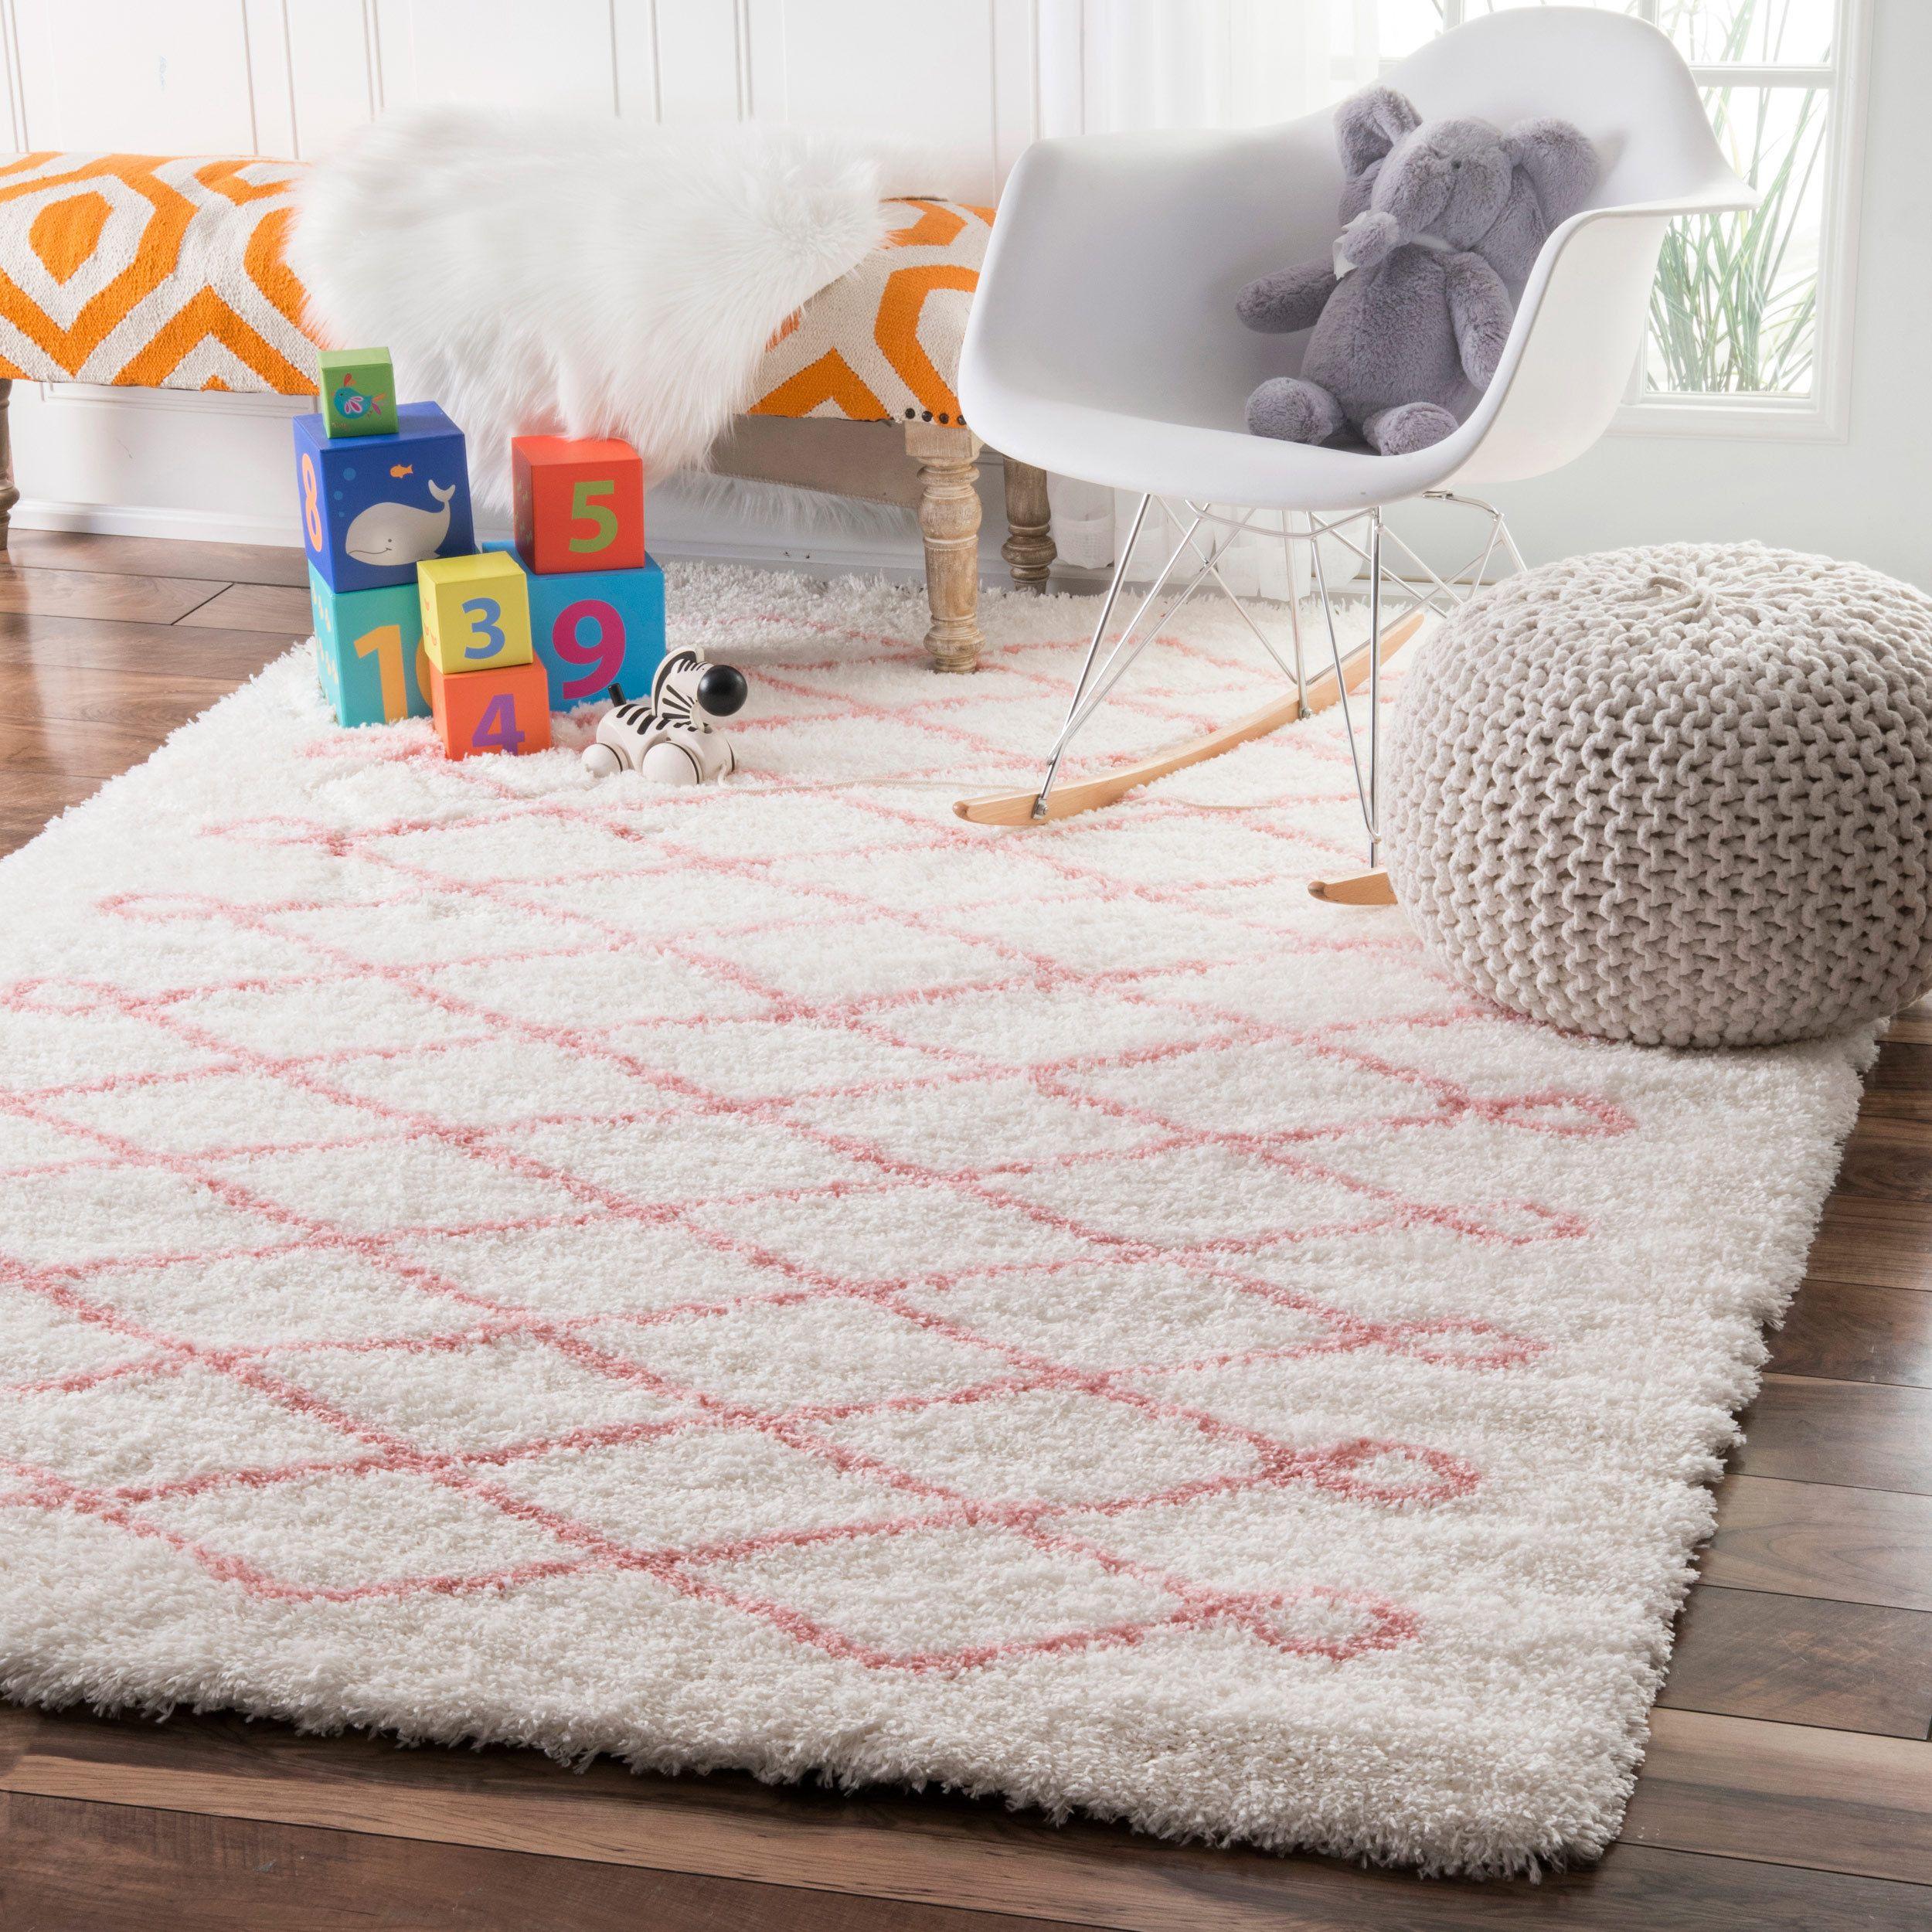 Nuloom Soft And Plush Cloudy Shag Diamond Kids Nursery Baby Pink Rug